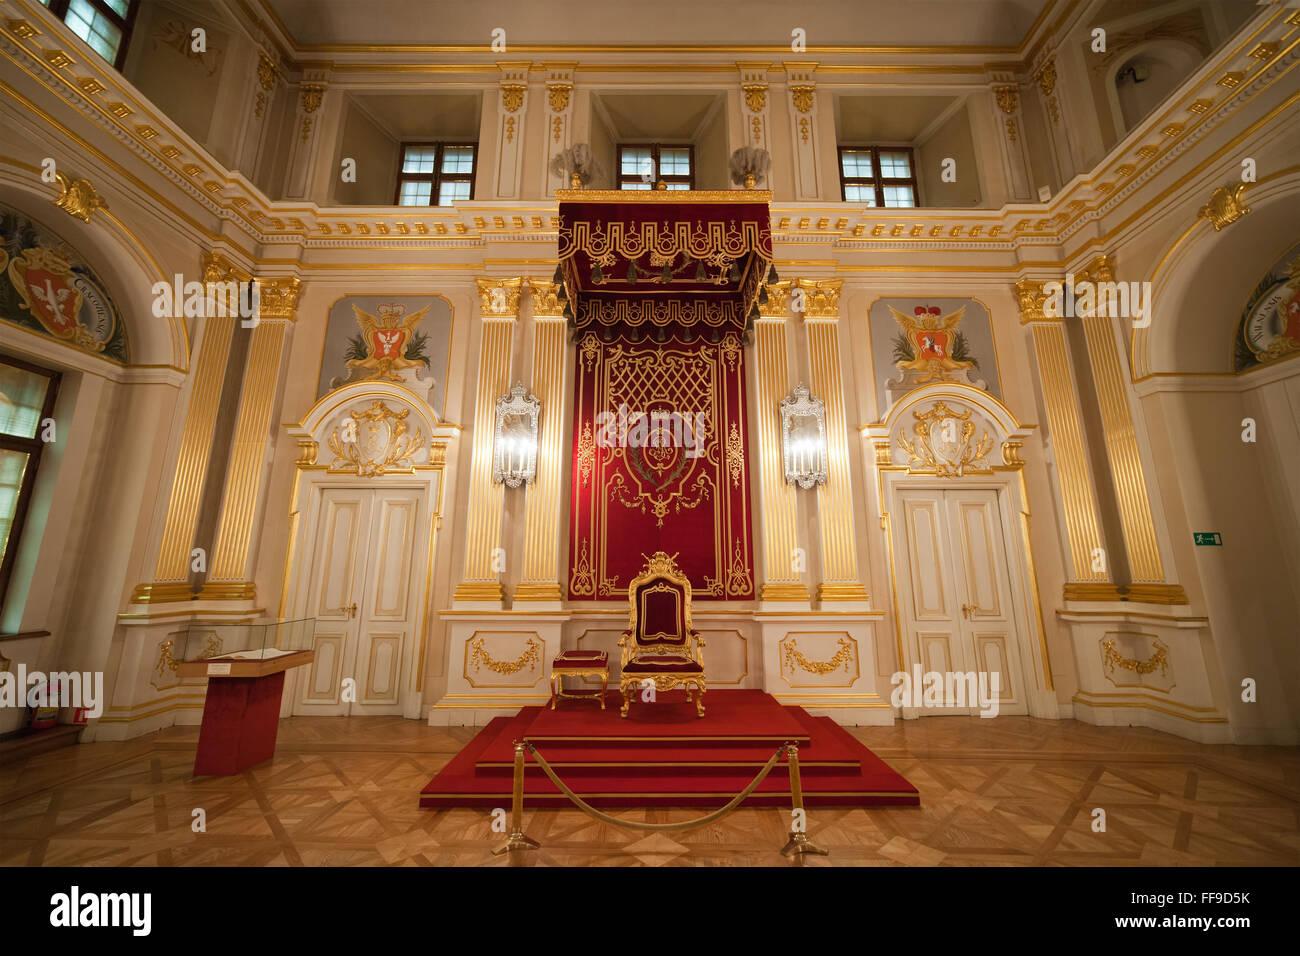 poland, city of warsaw, royal castle interior, throne in senators